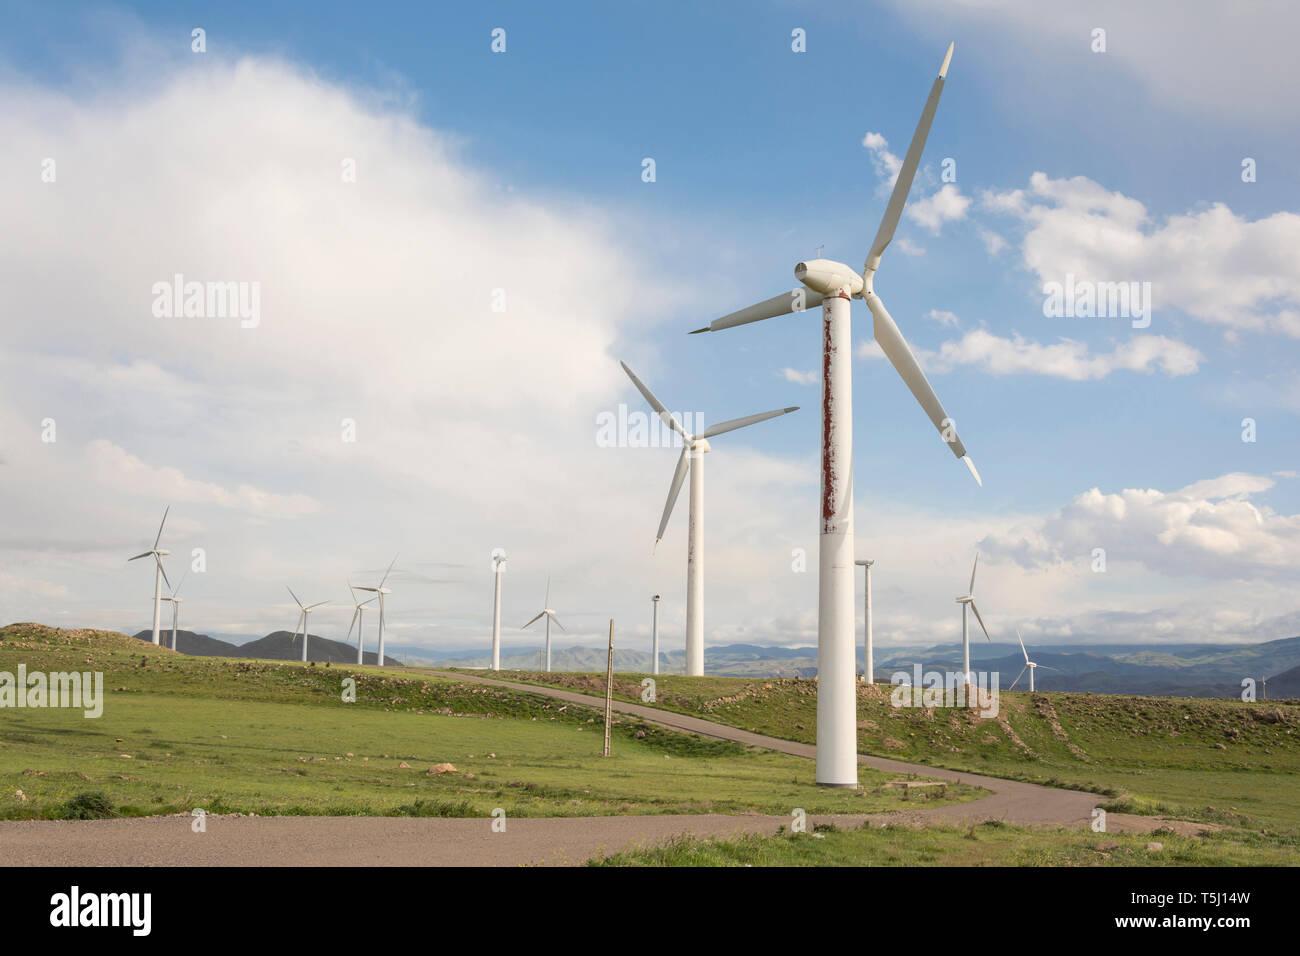 Windmills farm, modern power generation technology, environmentally friendly electricity production - Stock Image